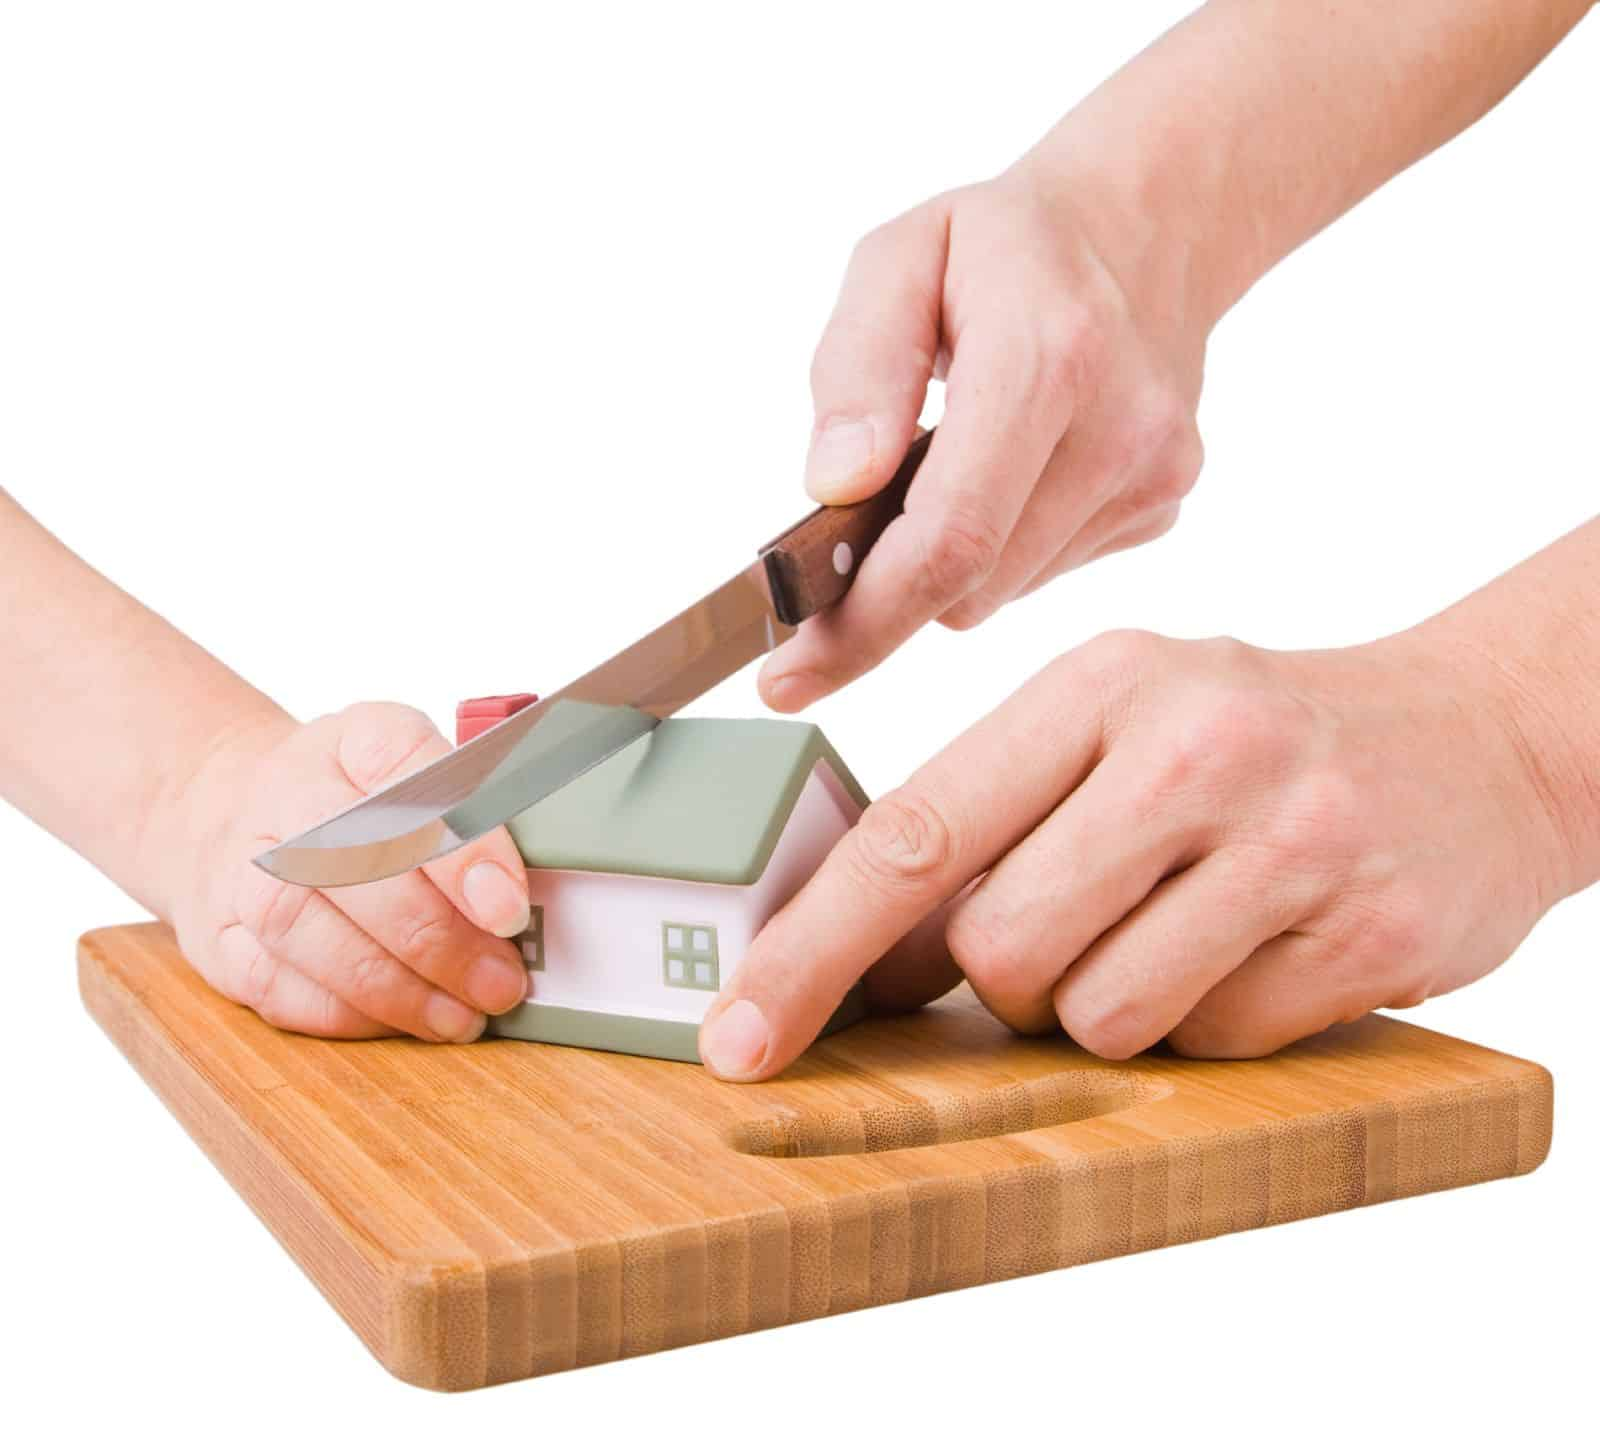 ризнание права собственности на долю в квартире